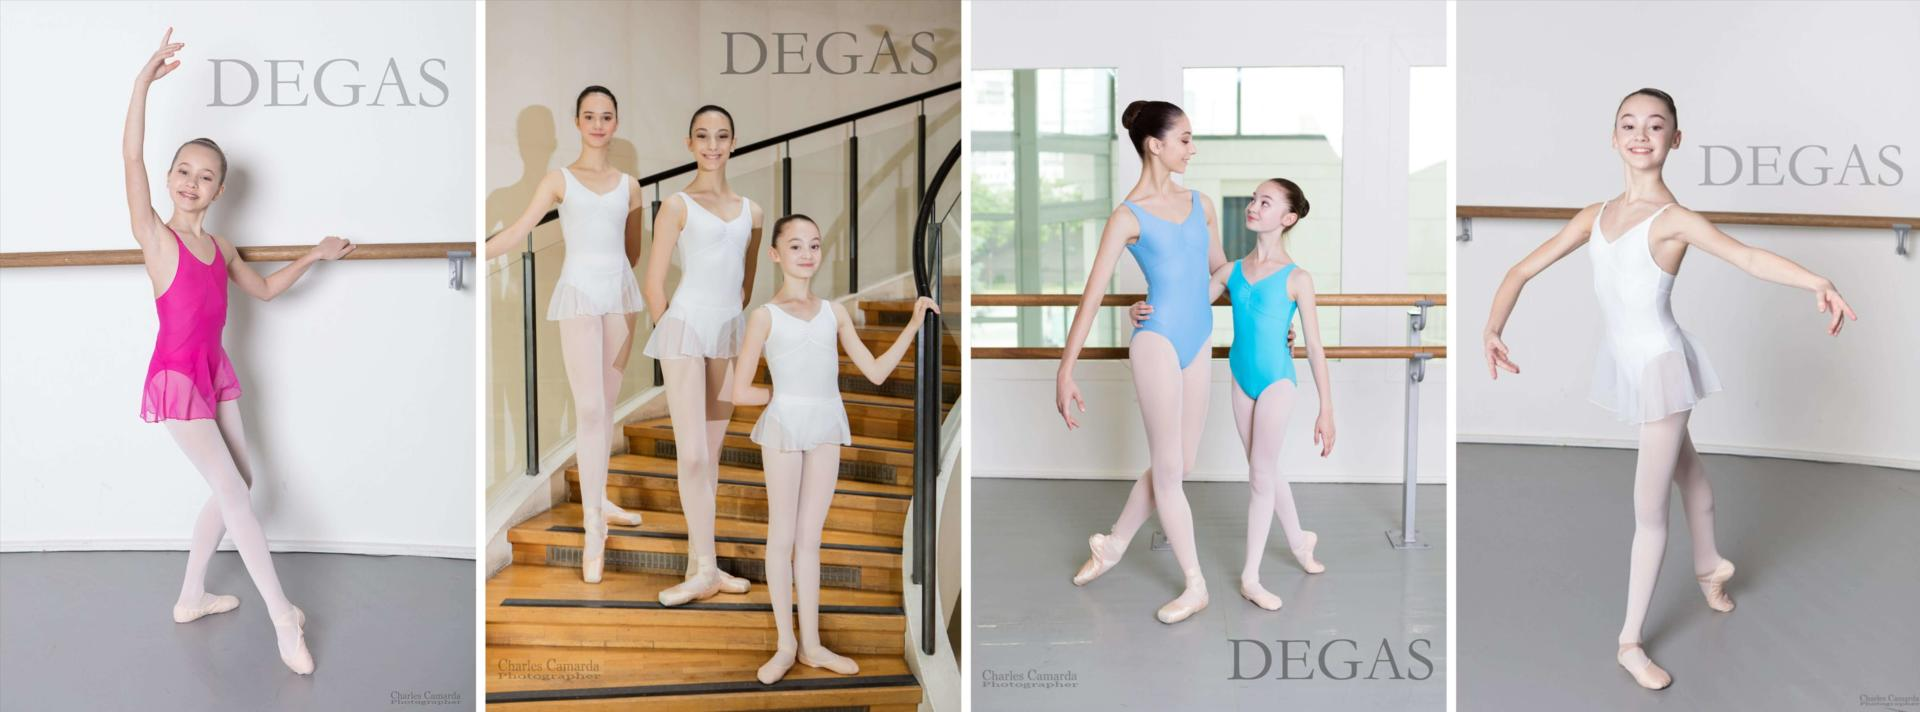 Tenues ecoles de danse Degas